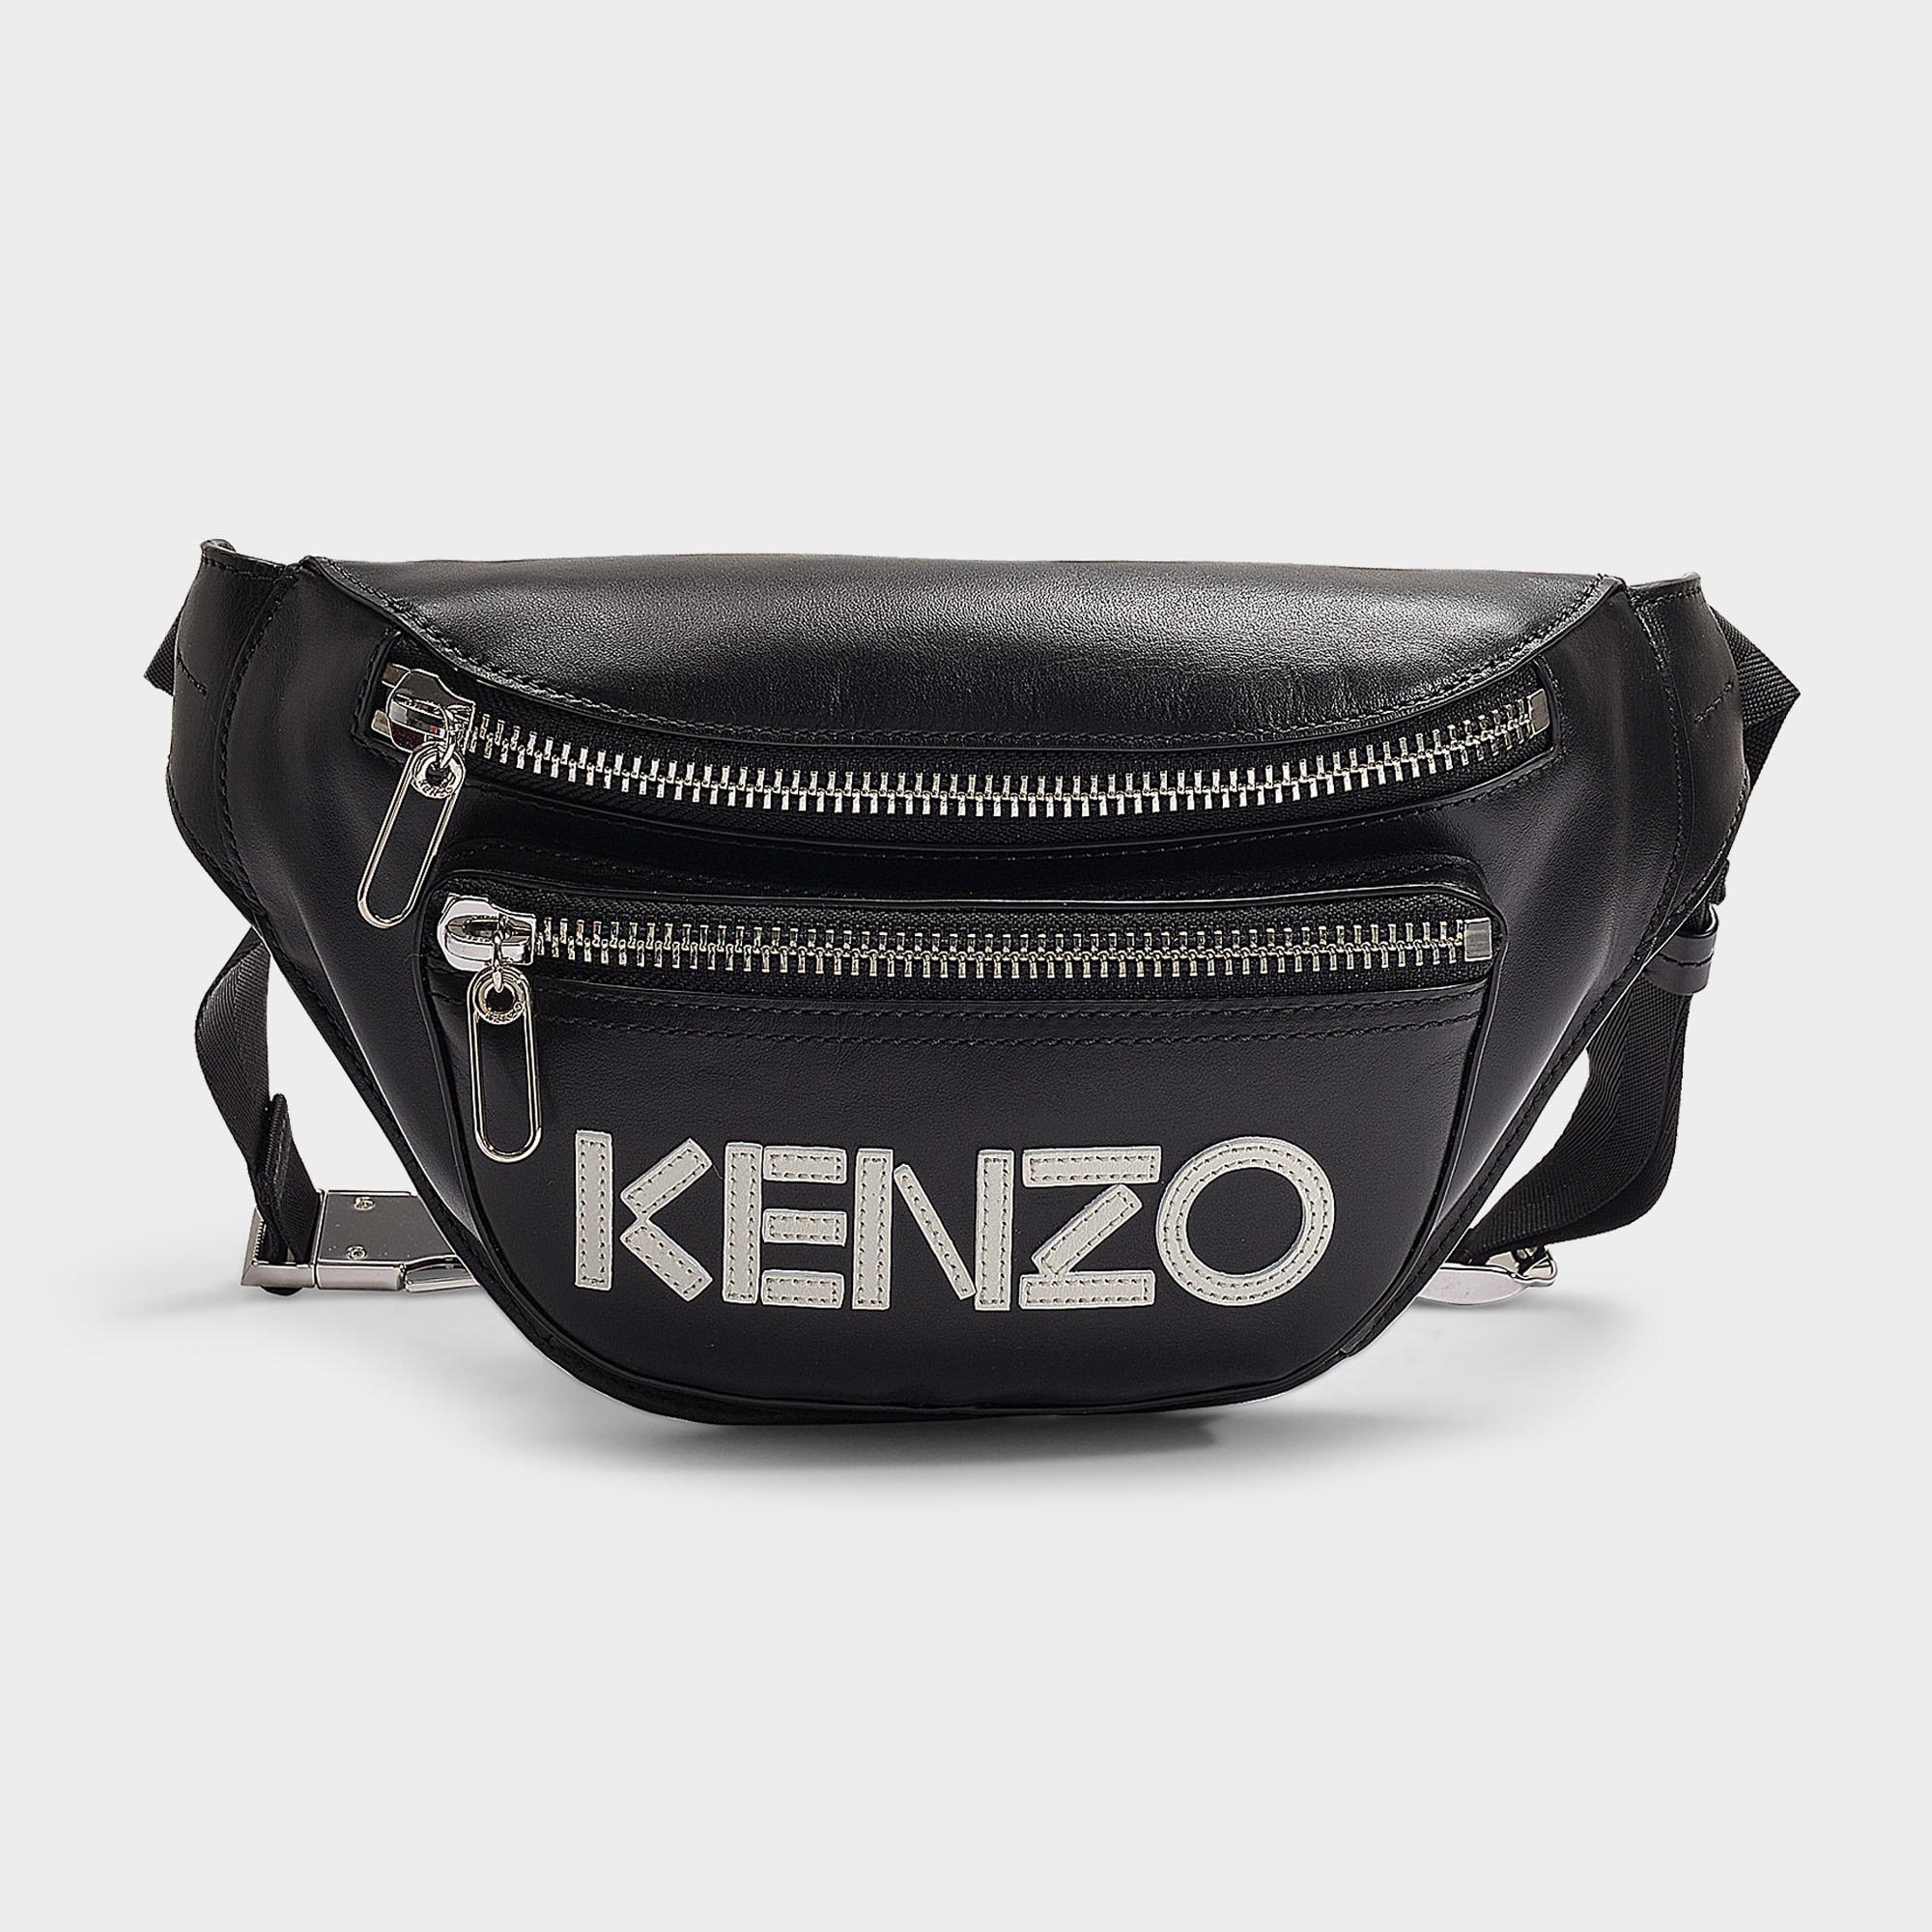 a7f967fe203d52 Kenzo | Logo Bum Bag In Black Calfskin | ModeSens